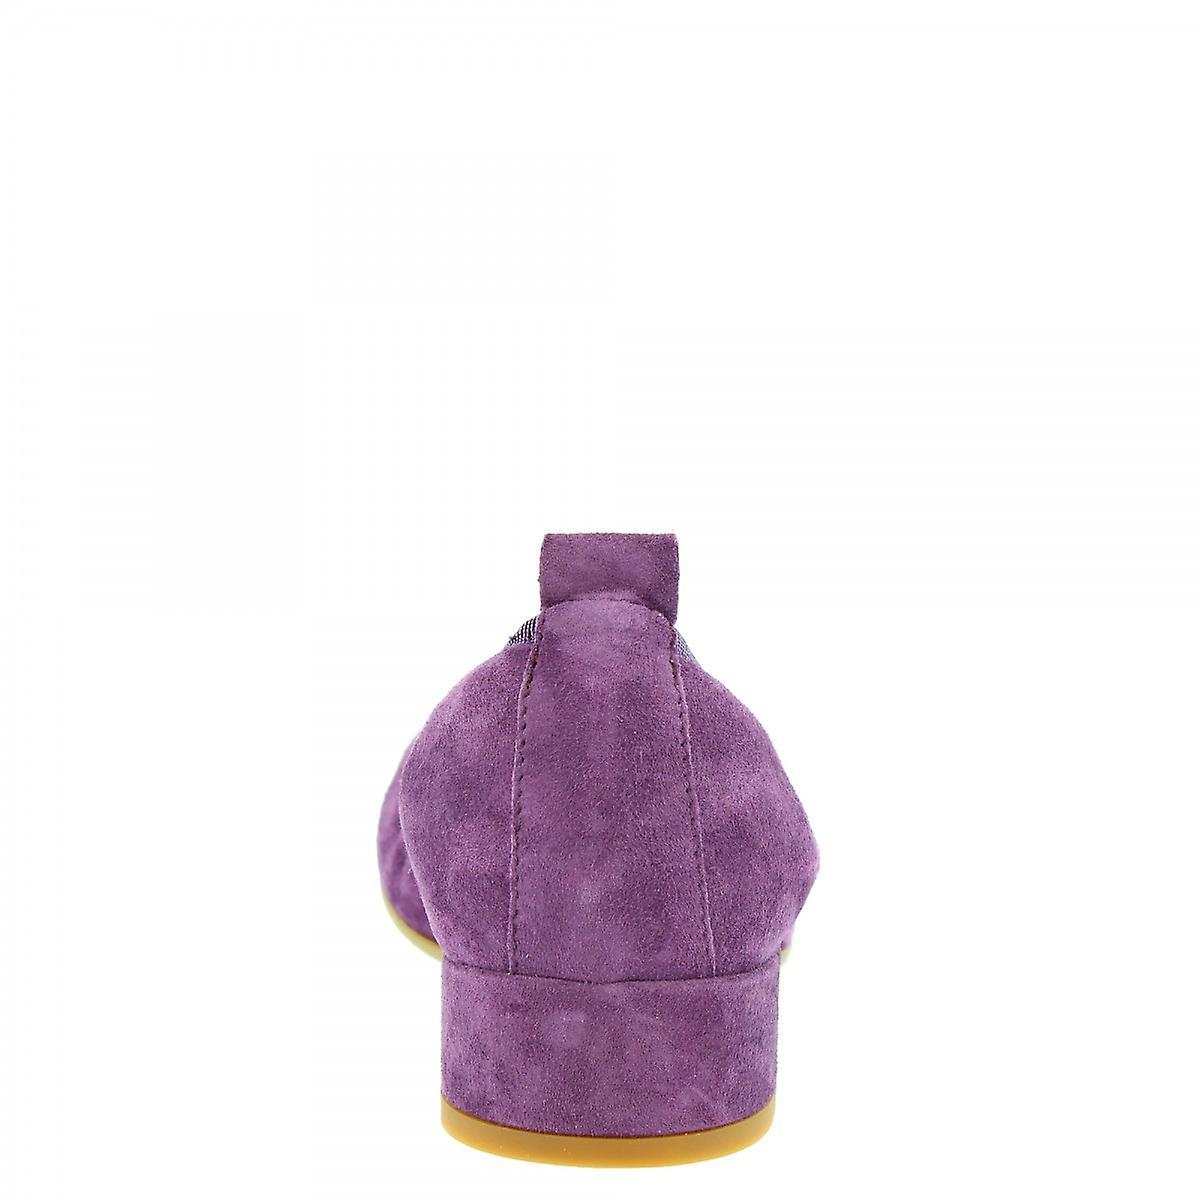 Leonardo Shoes Women's Handmade Low Heeled Ballet Flats Purple Suede Leather